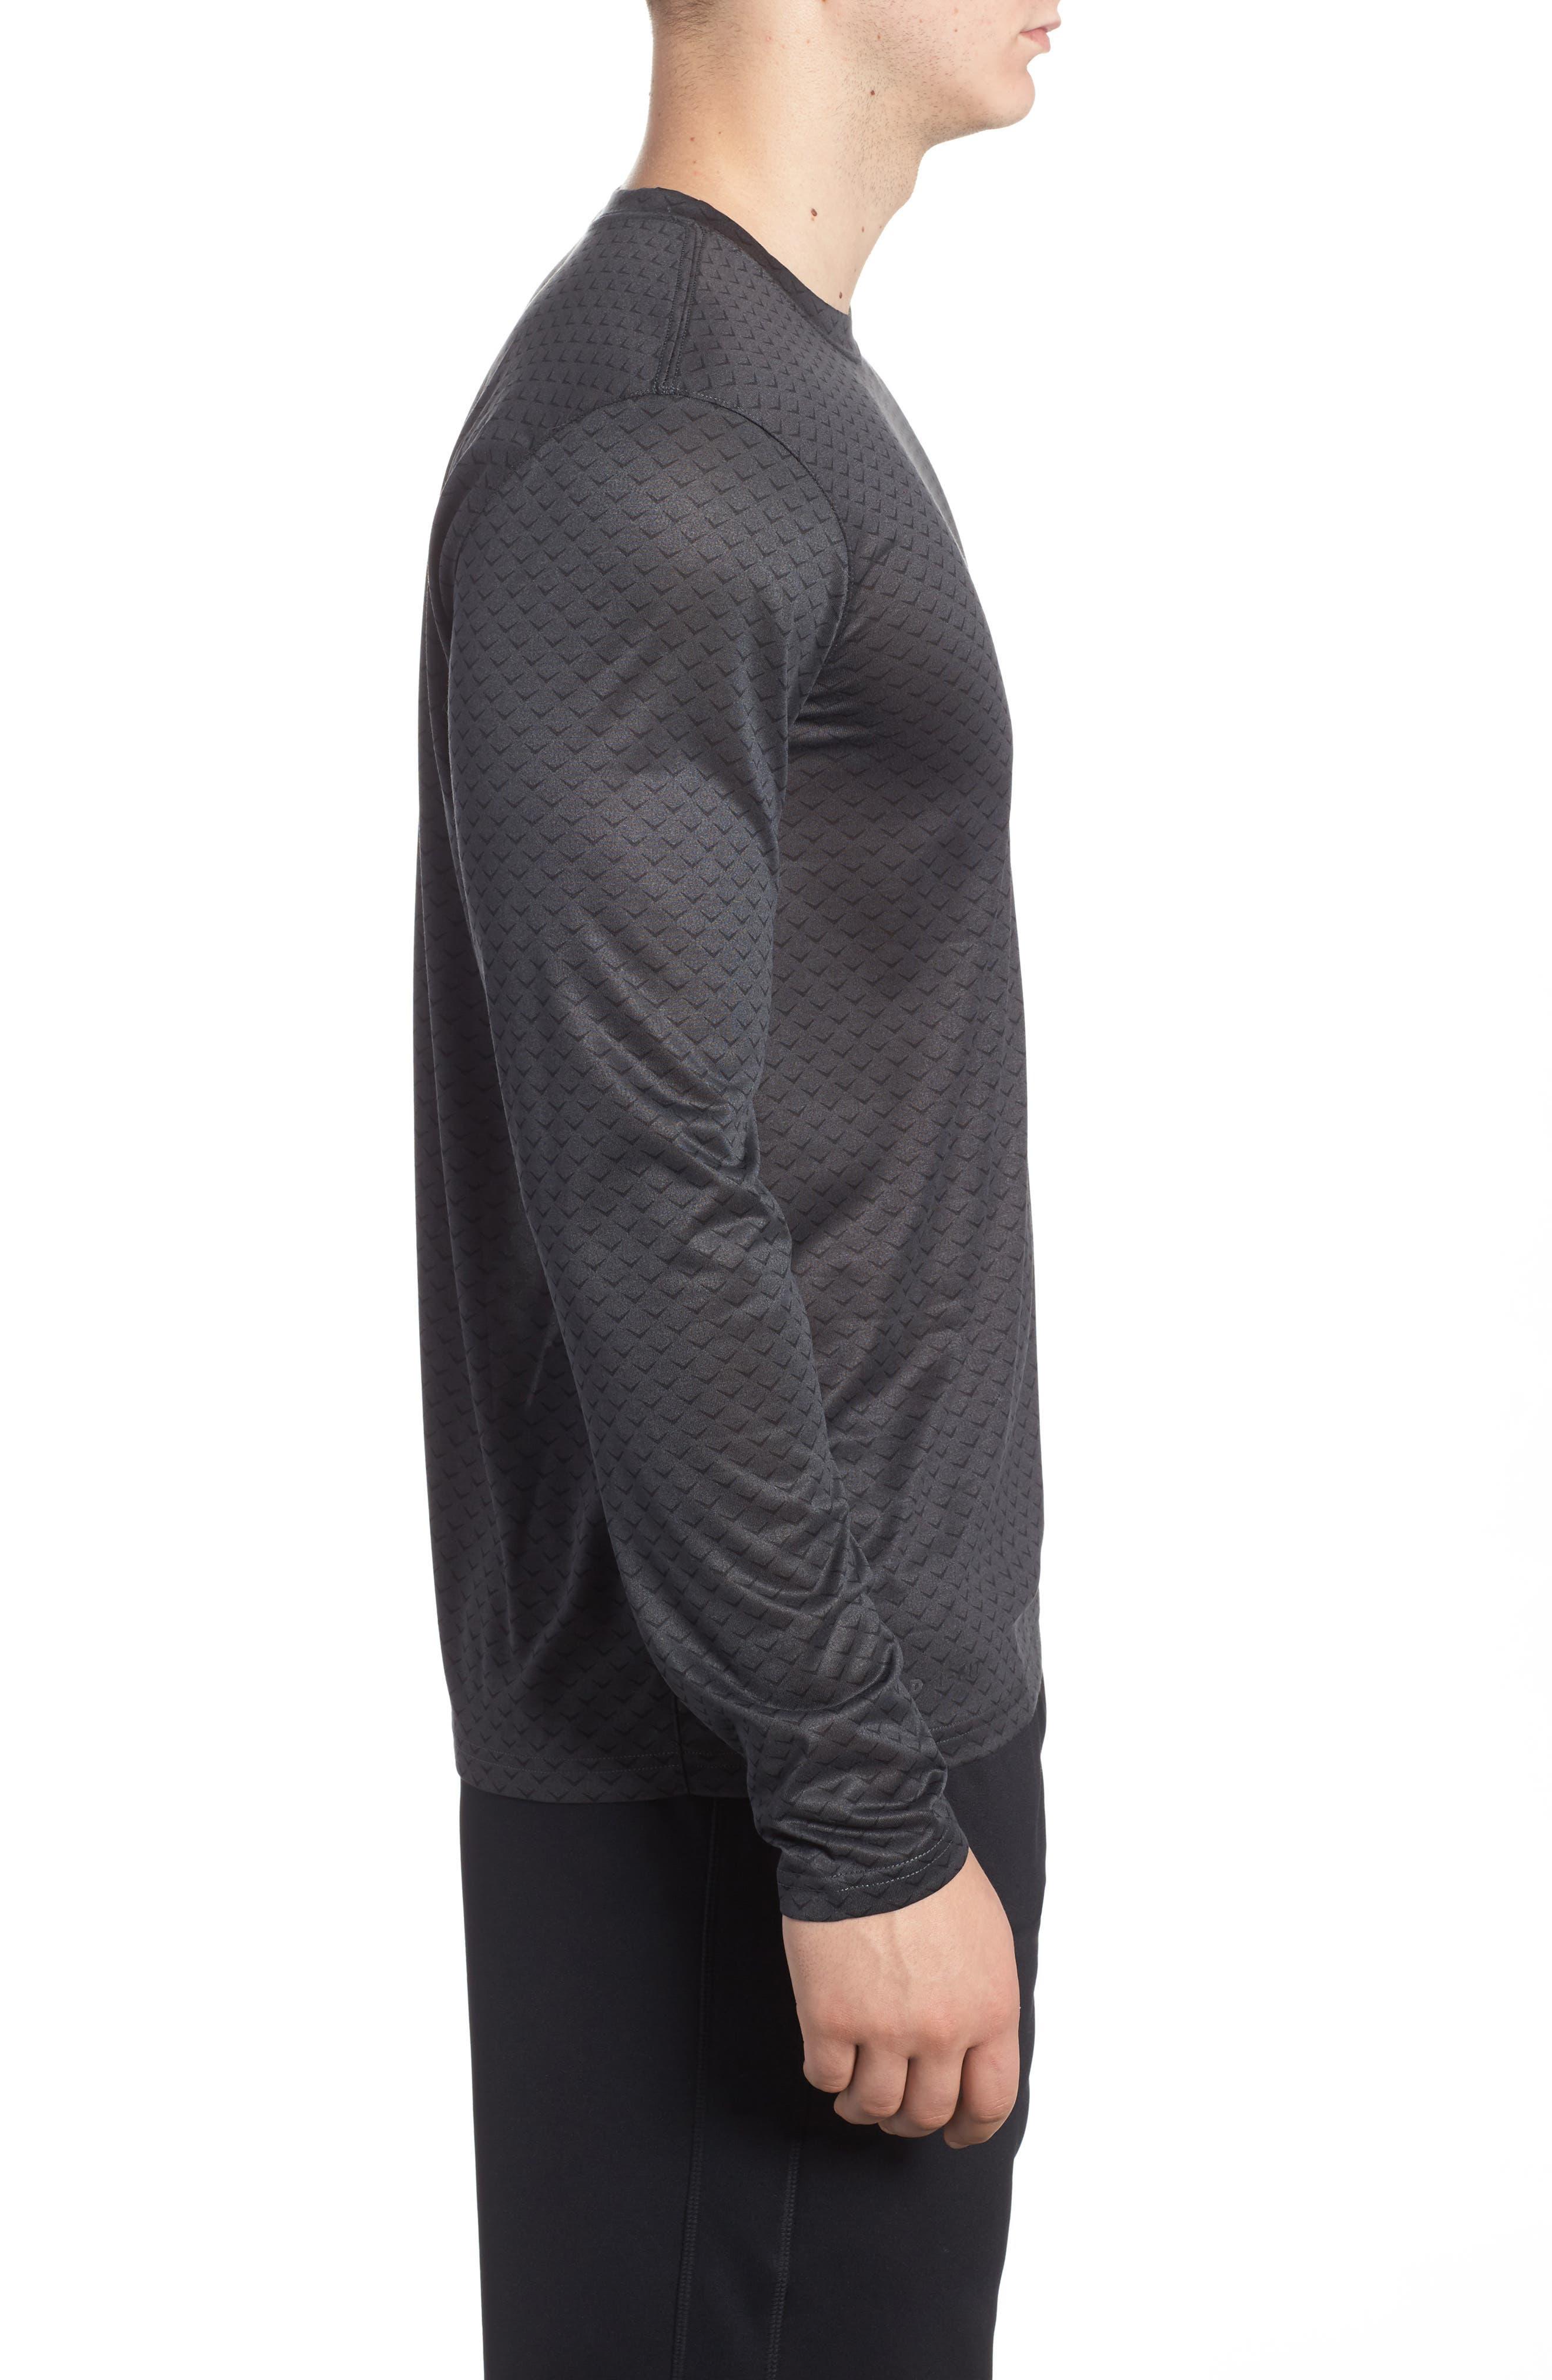 Dry Legend Training T-Shirt,                             Alternate thumbnail 3, color,                             Anthracite/ White